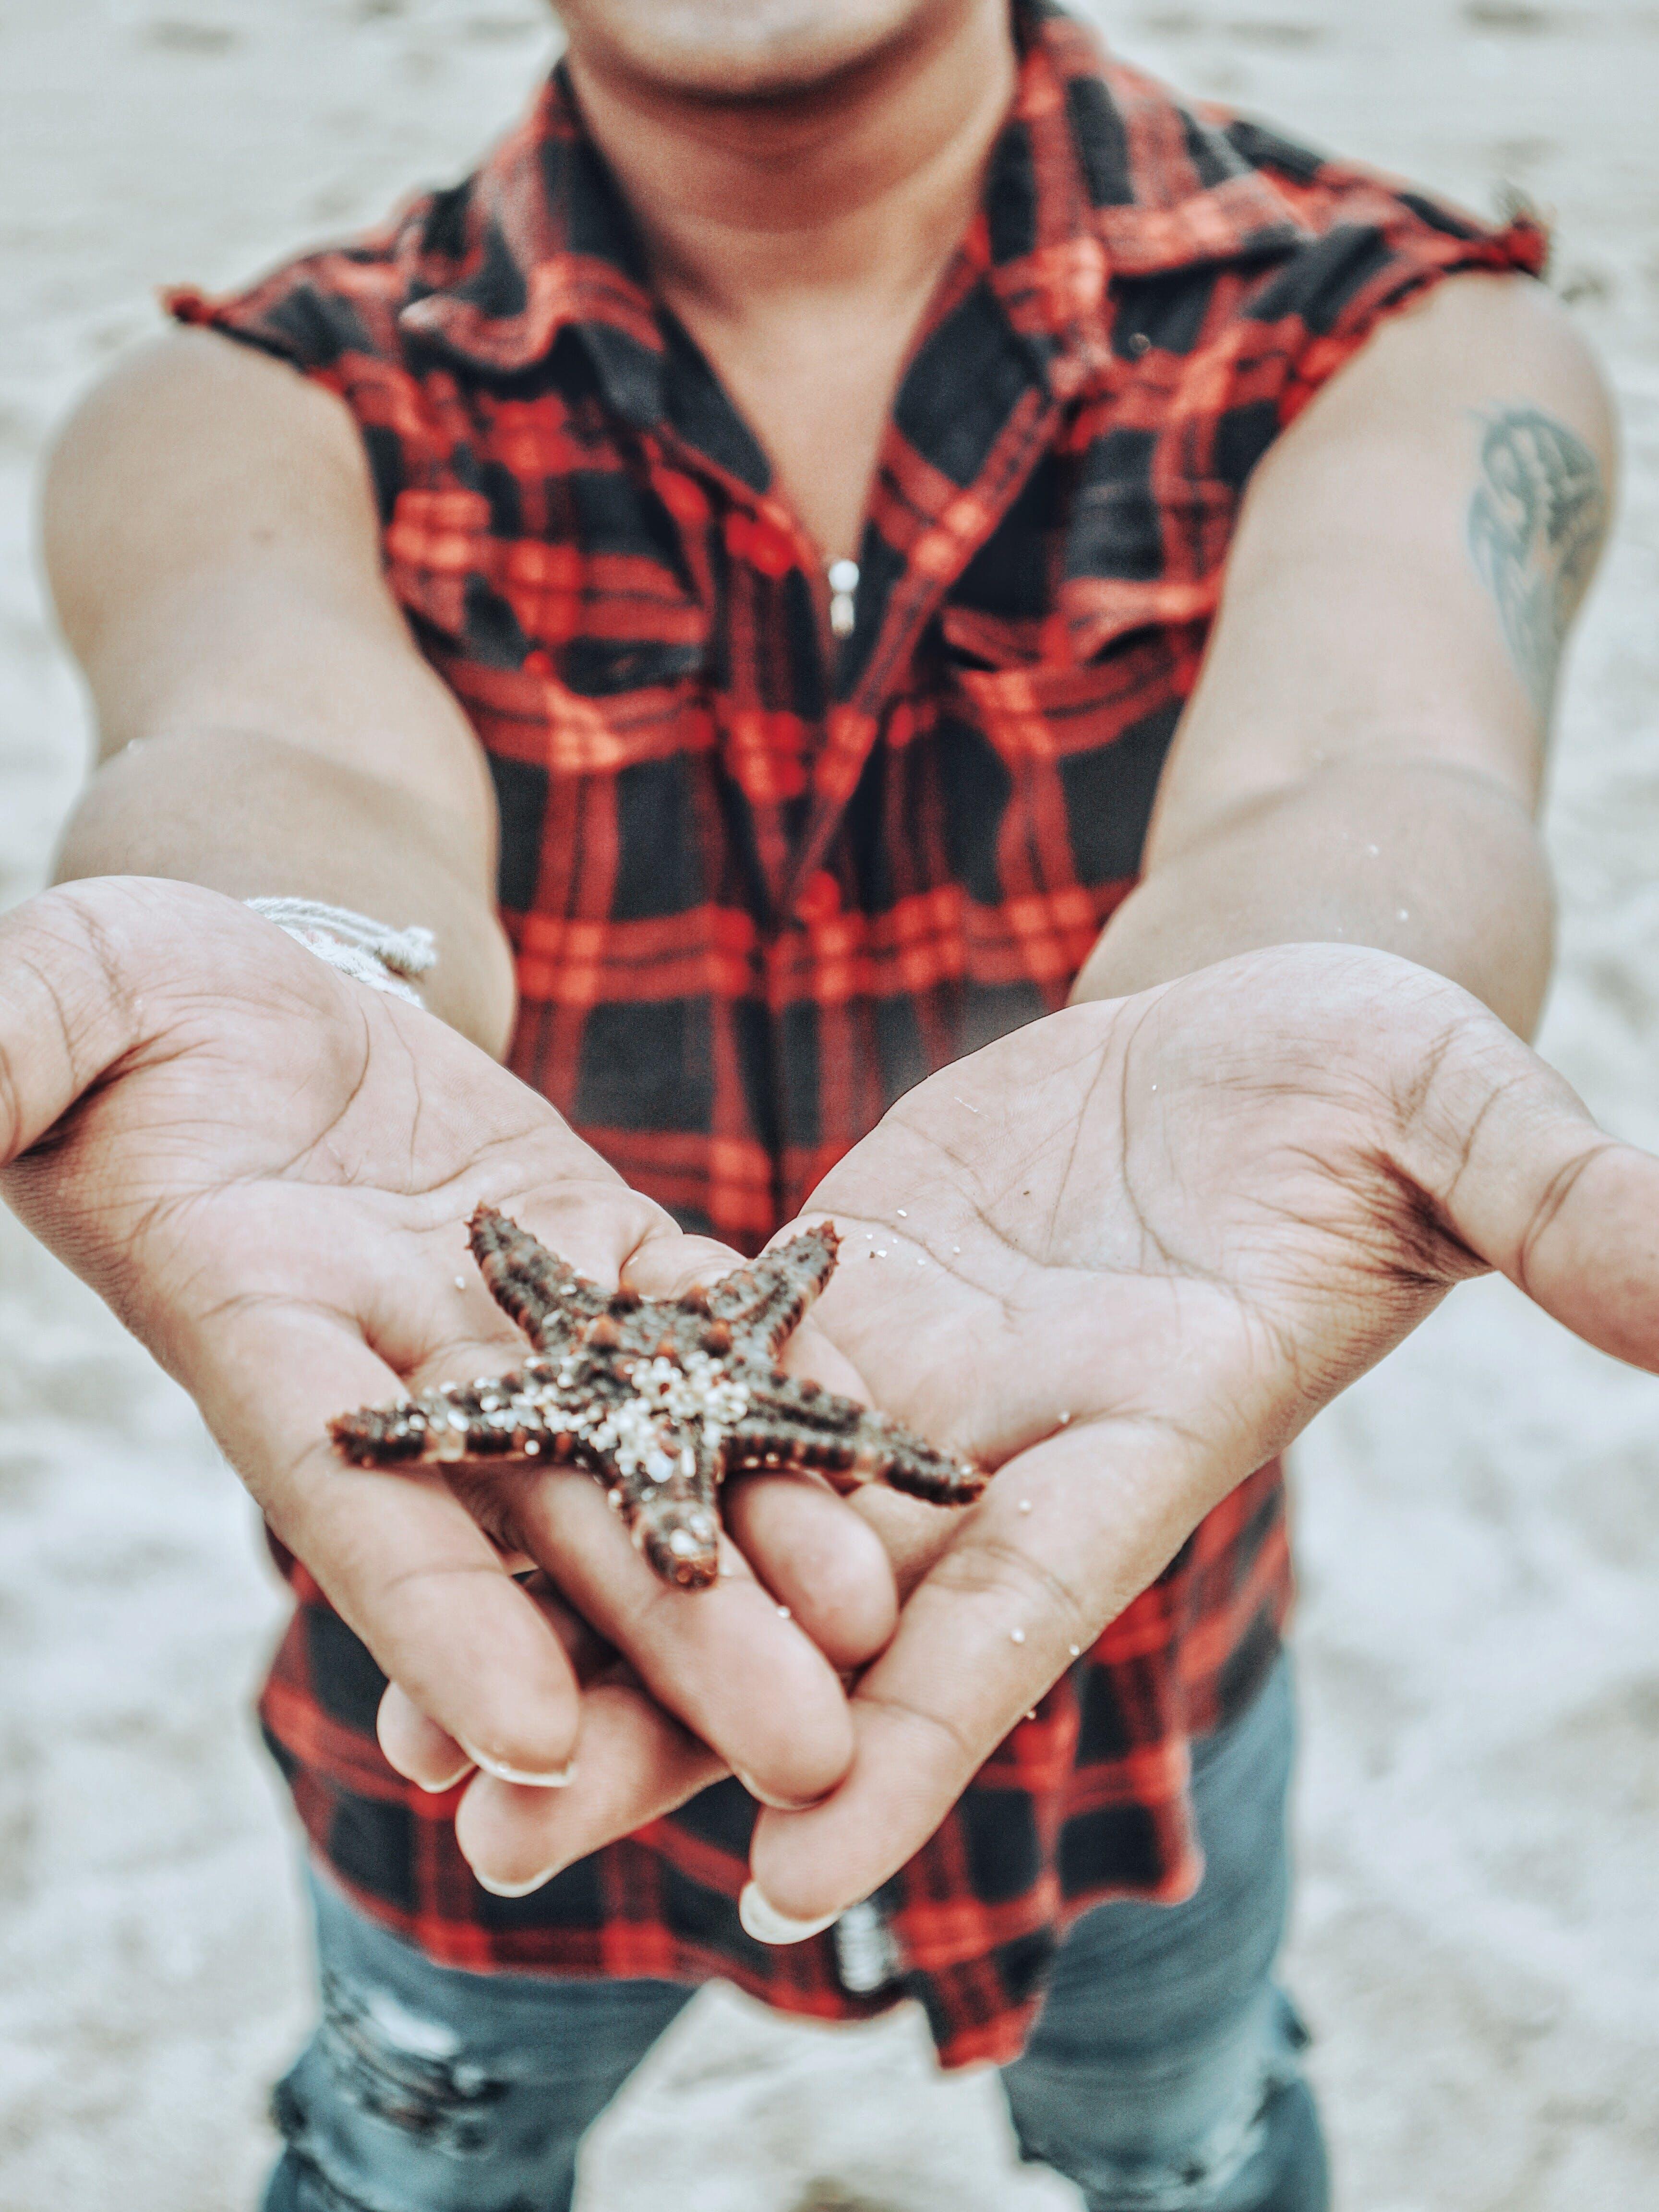 Man Holding Starfish